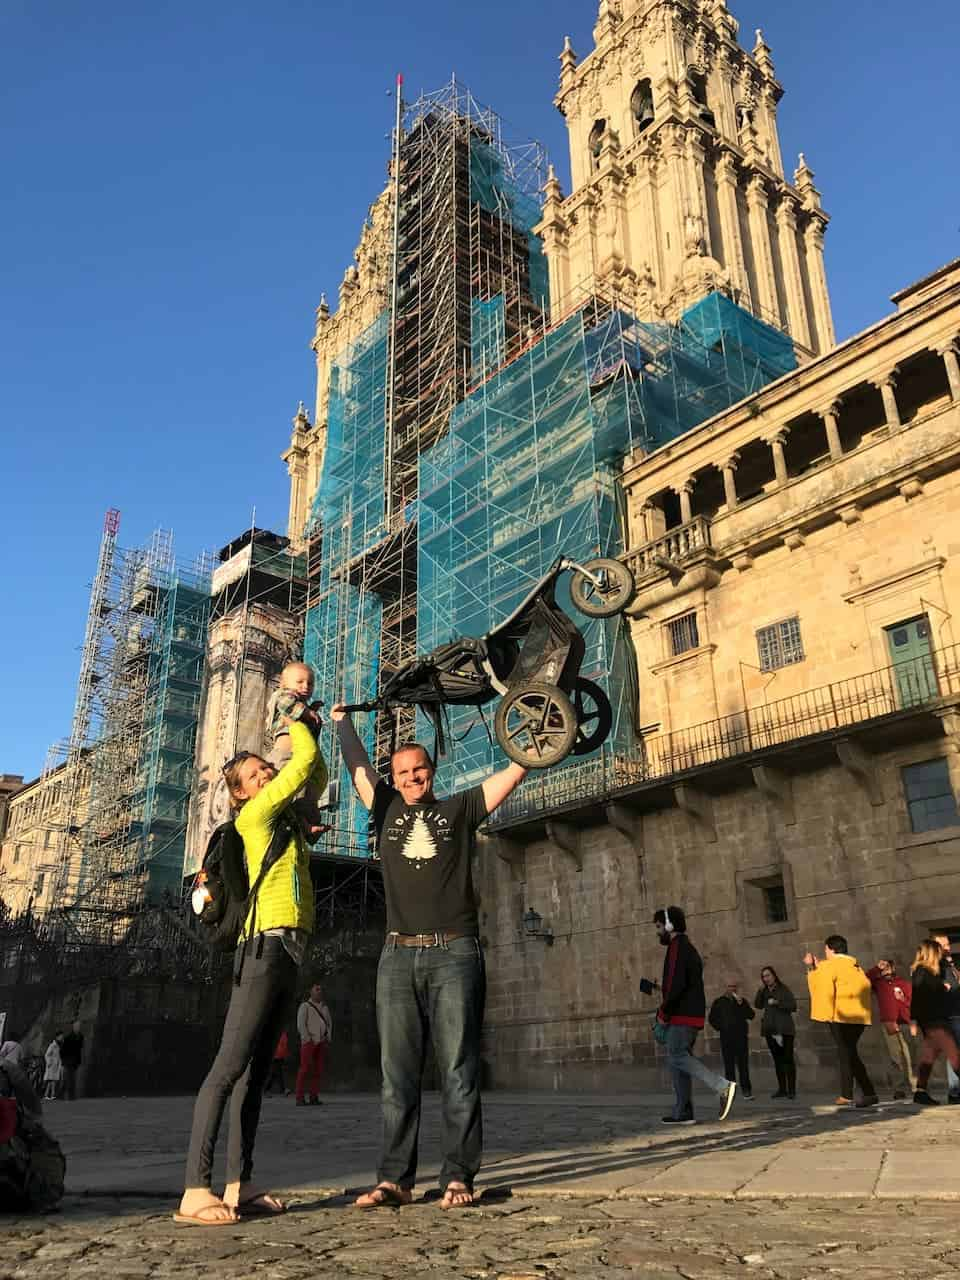 Celebrating their arrival to Santiago de Compostela